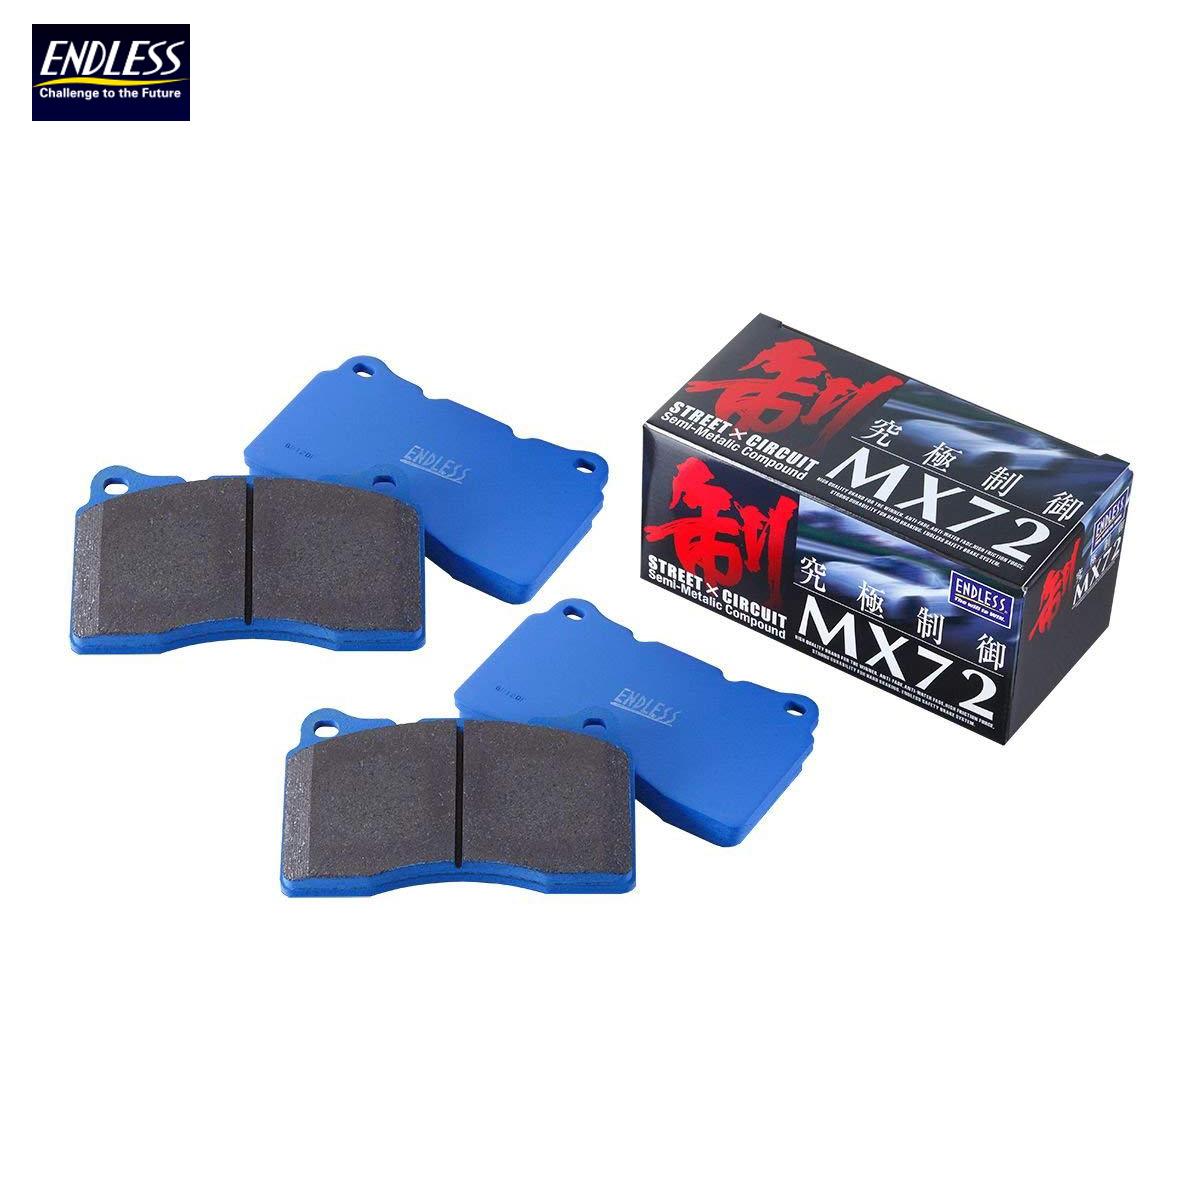 ENDLESS エンドレス ブレーキパッド MX72 フロント EP449 ヴォクシー VOXY ZRR80G G X XCパッケージ